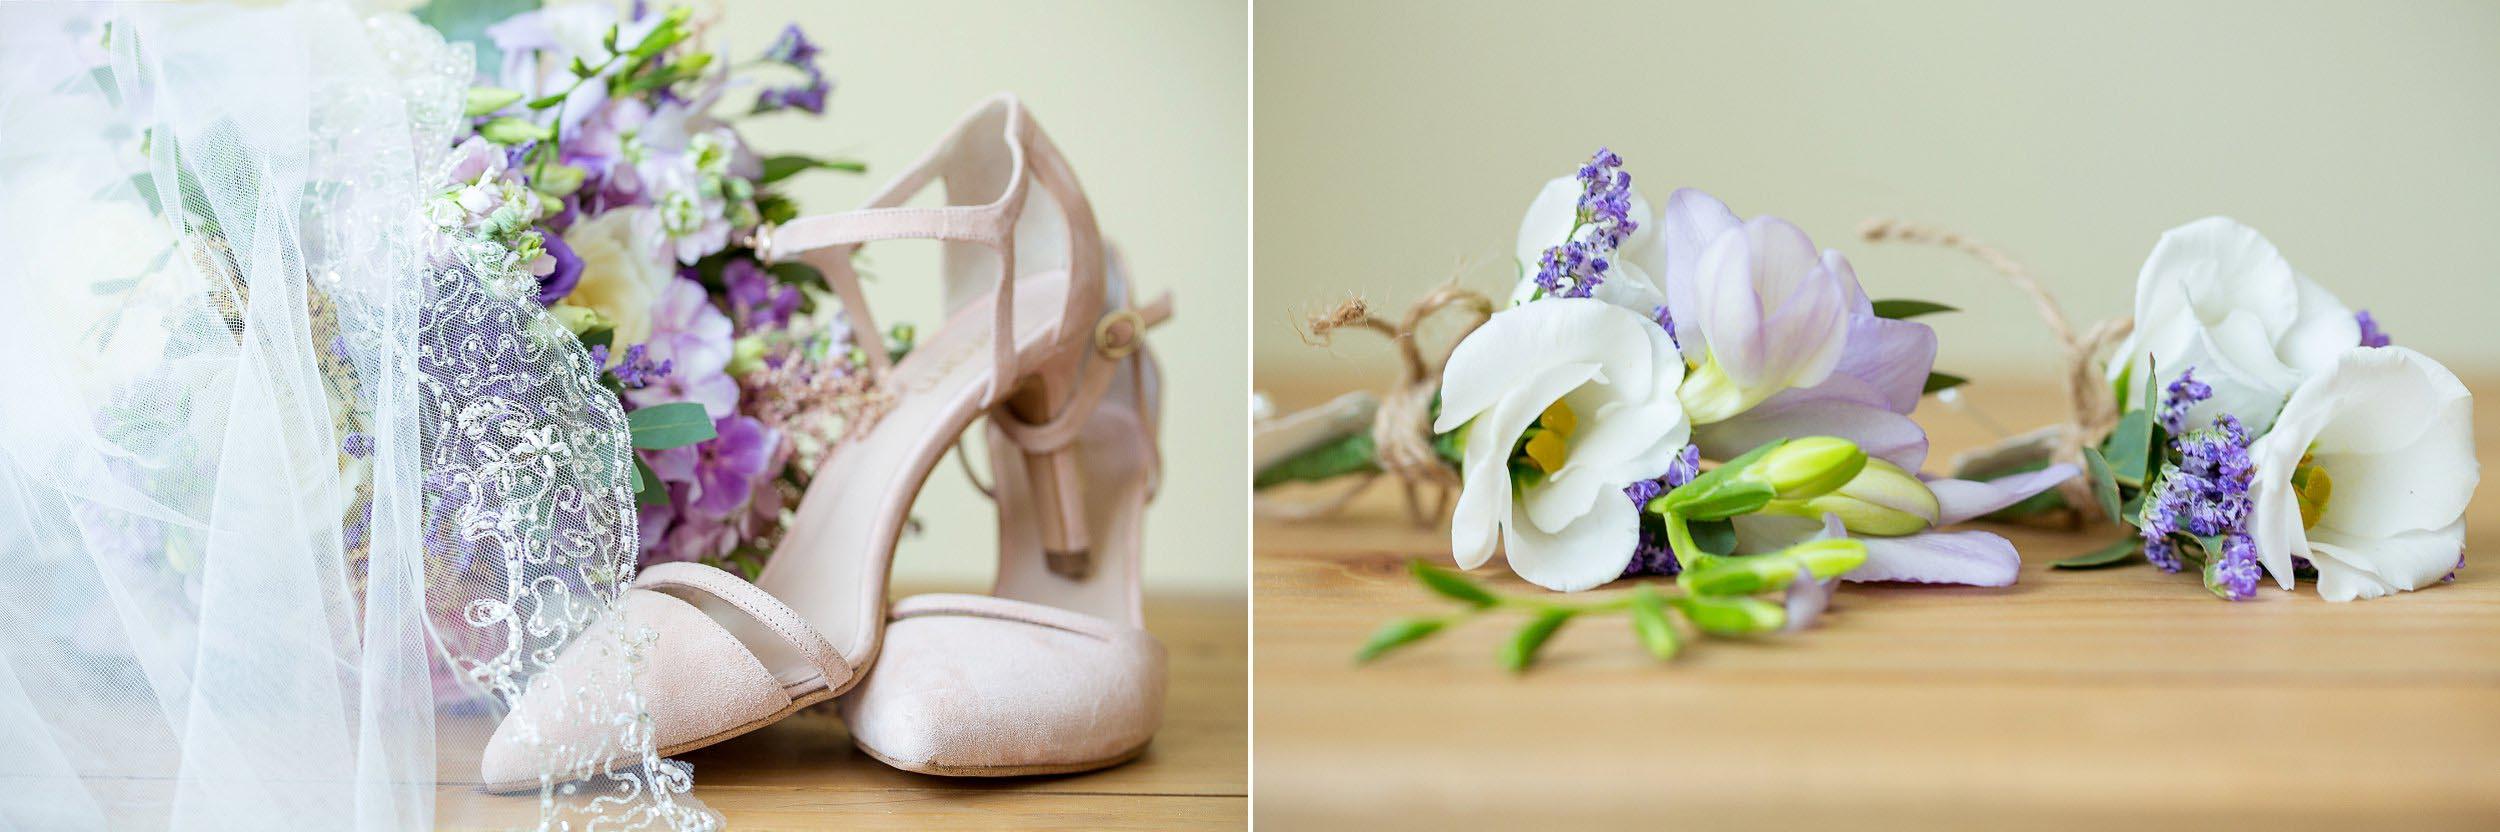 Marks-Hall-Wedding-Photographer-4.jpg